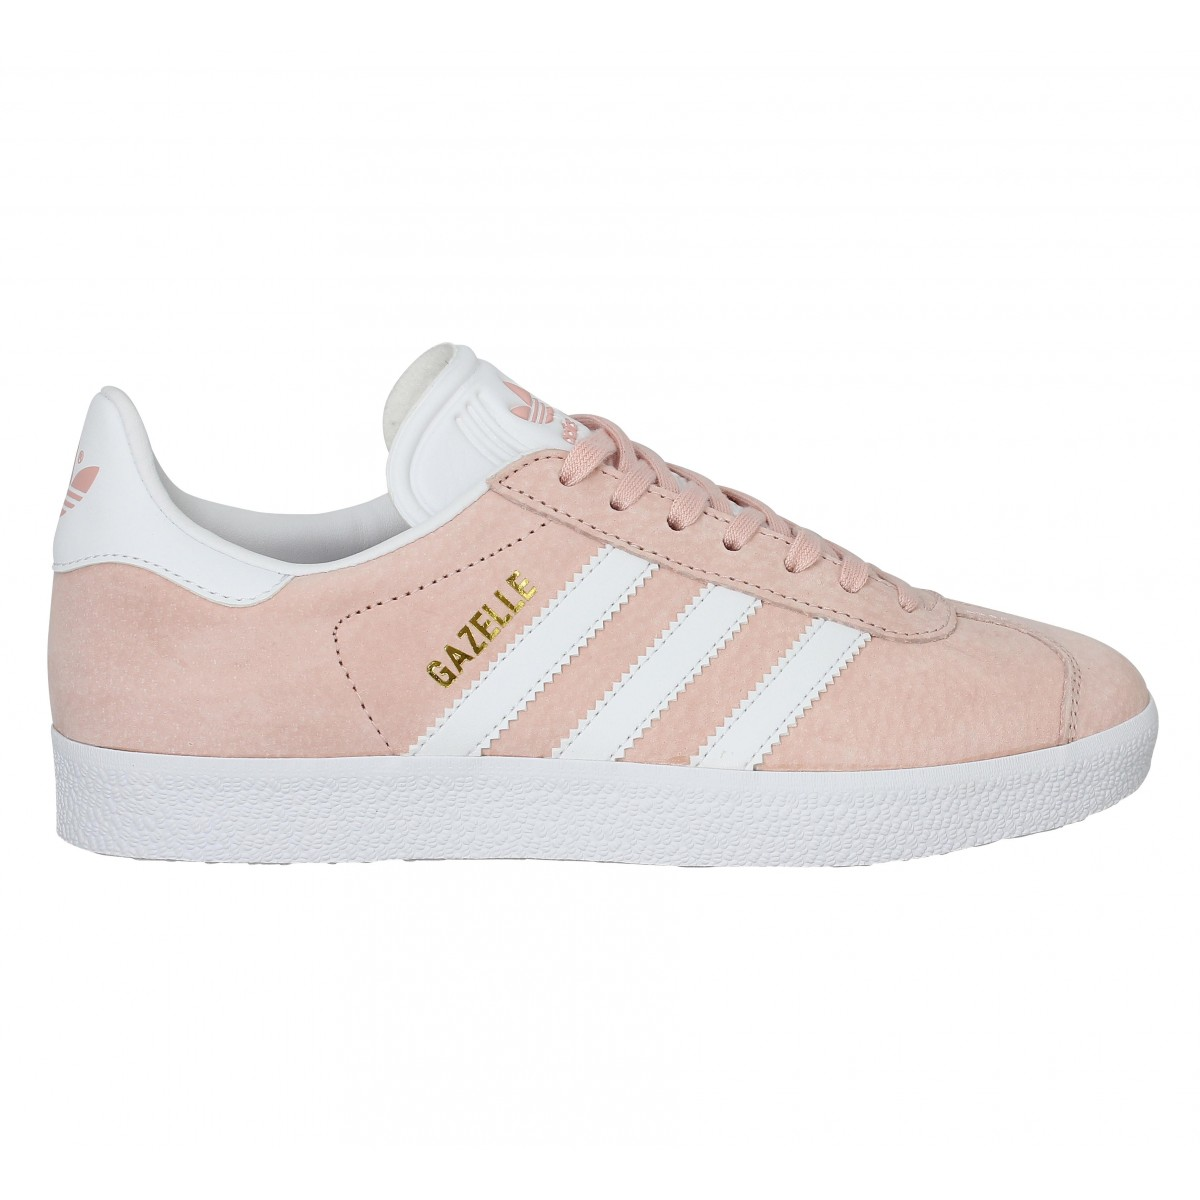 adidas gazelle grise et rose femme